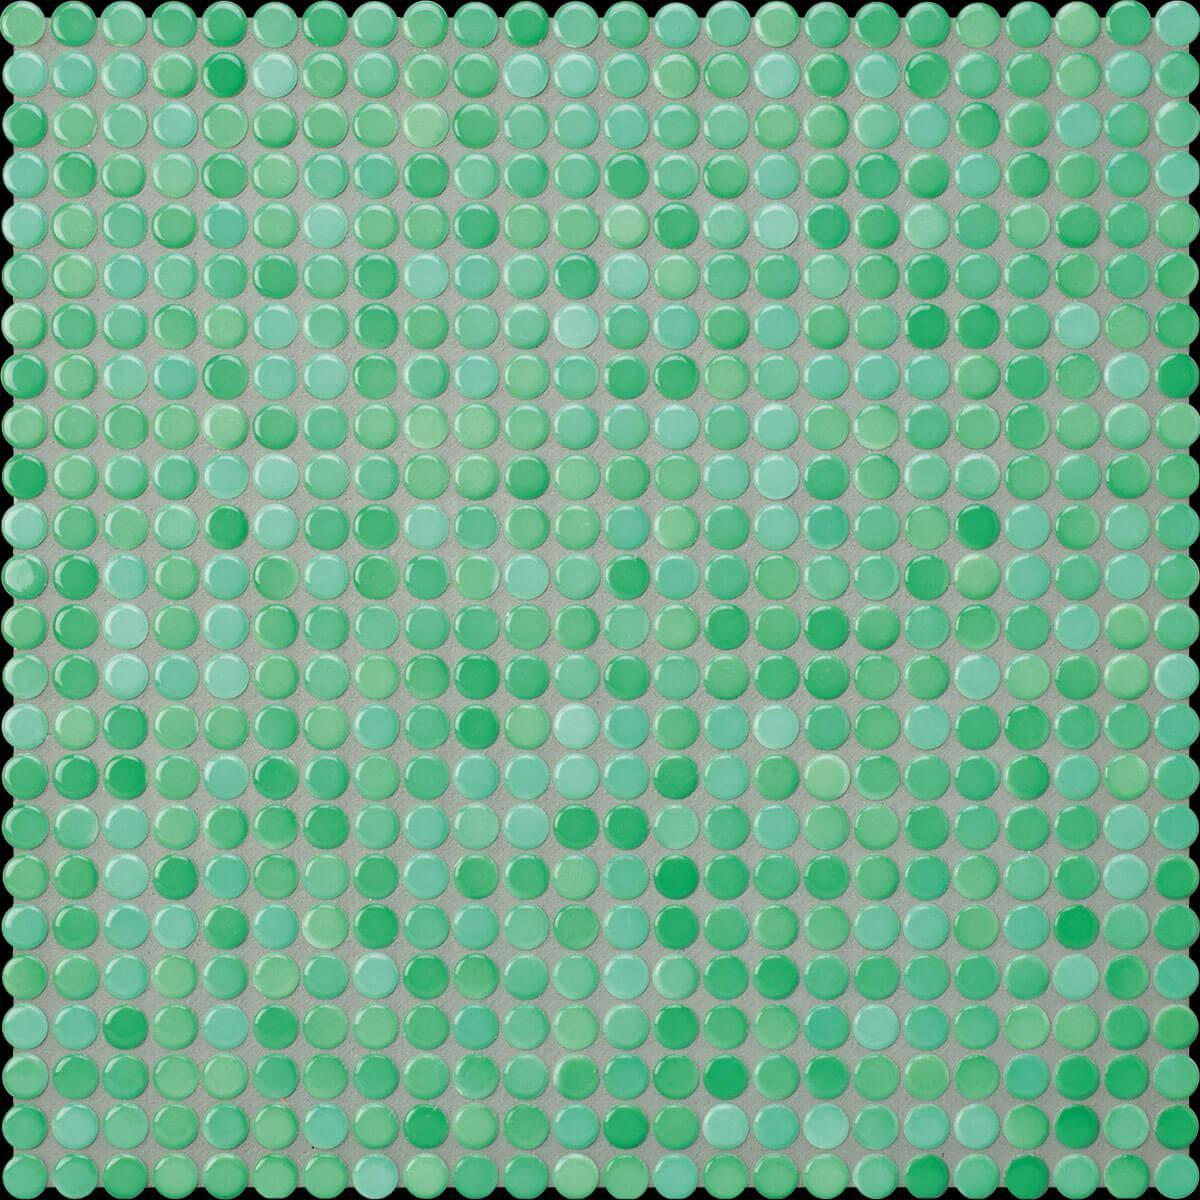 Agrob Buchtal Tiles - KLAY_Loop-_0003_40011H